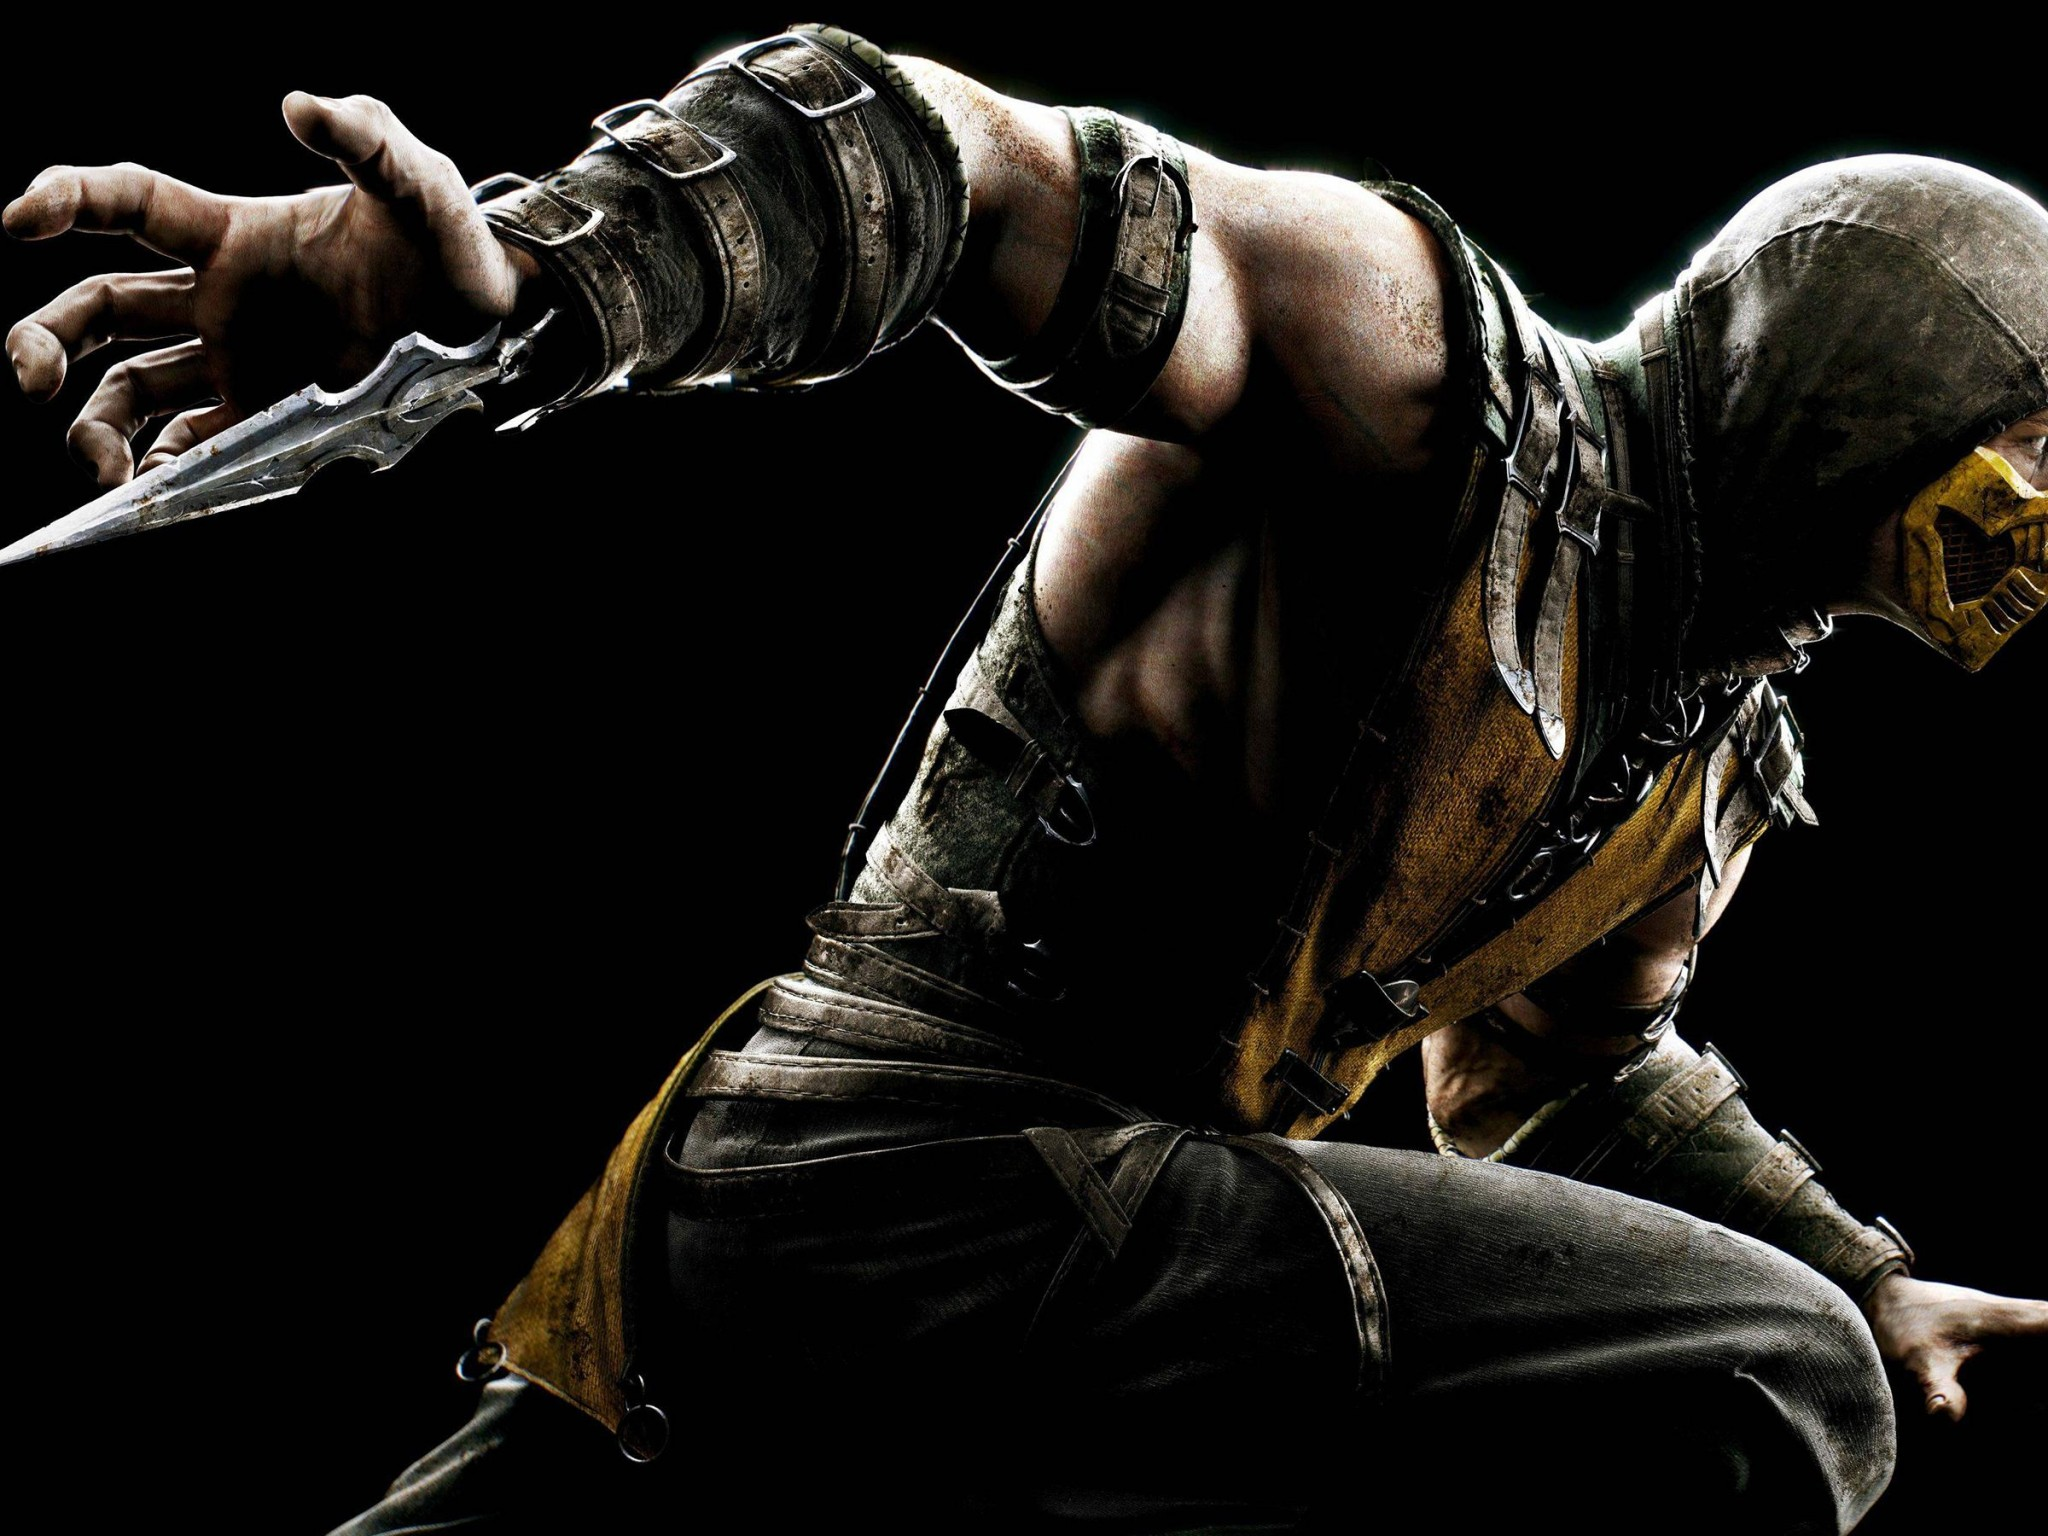 Mortal Kombat X Scorpion HD desktop wallpaper Widescreen High 2048x1536